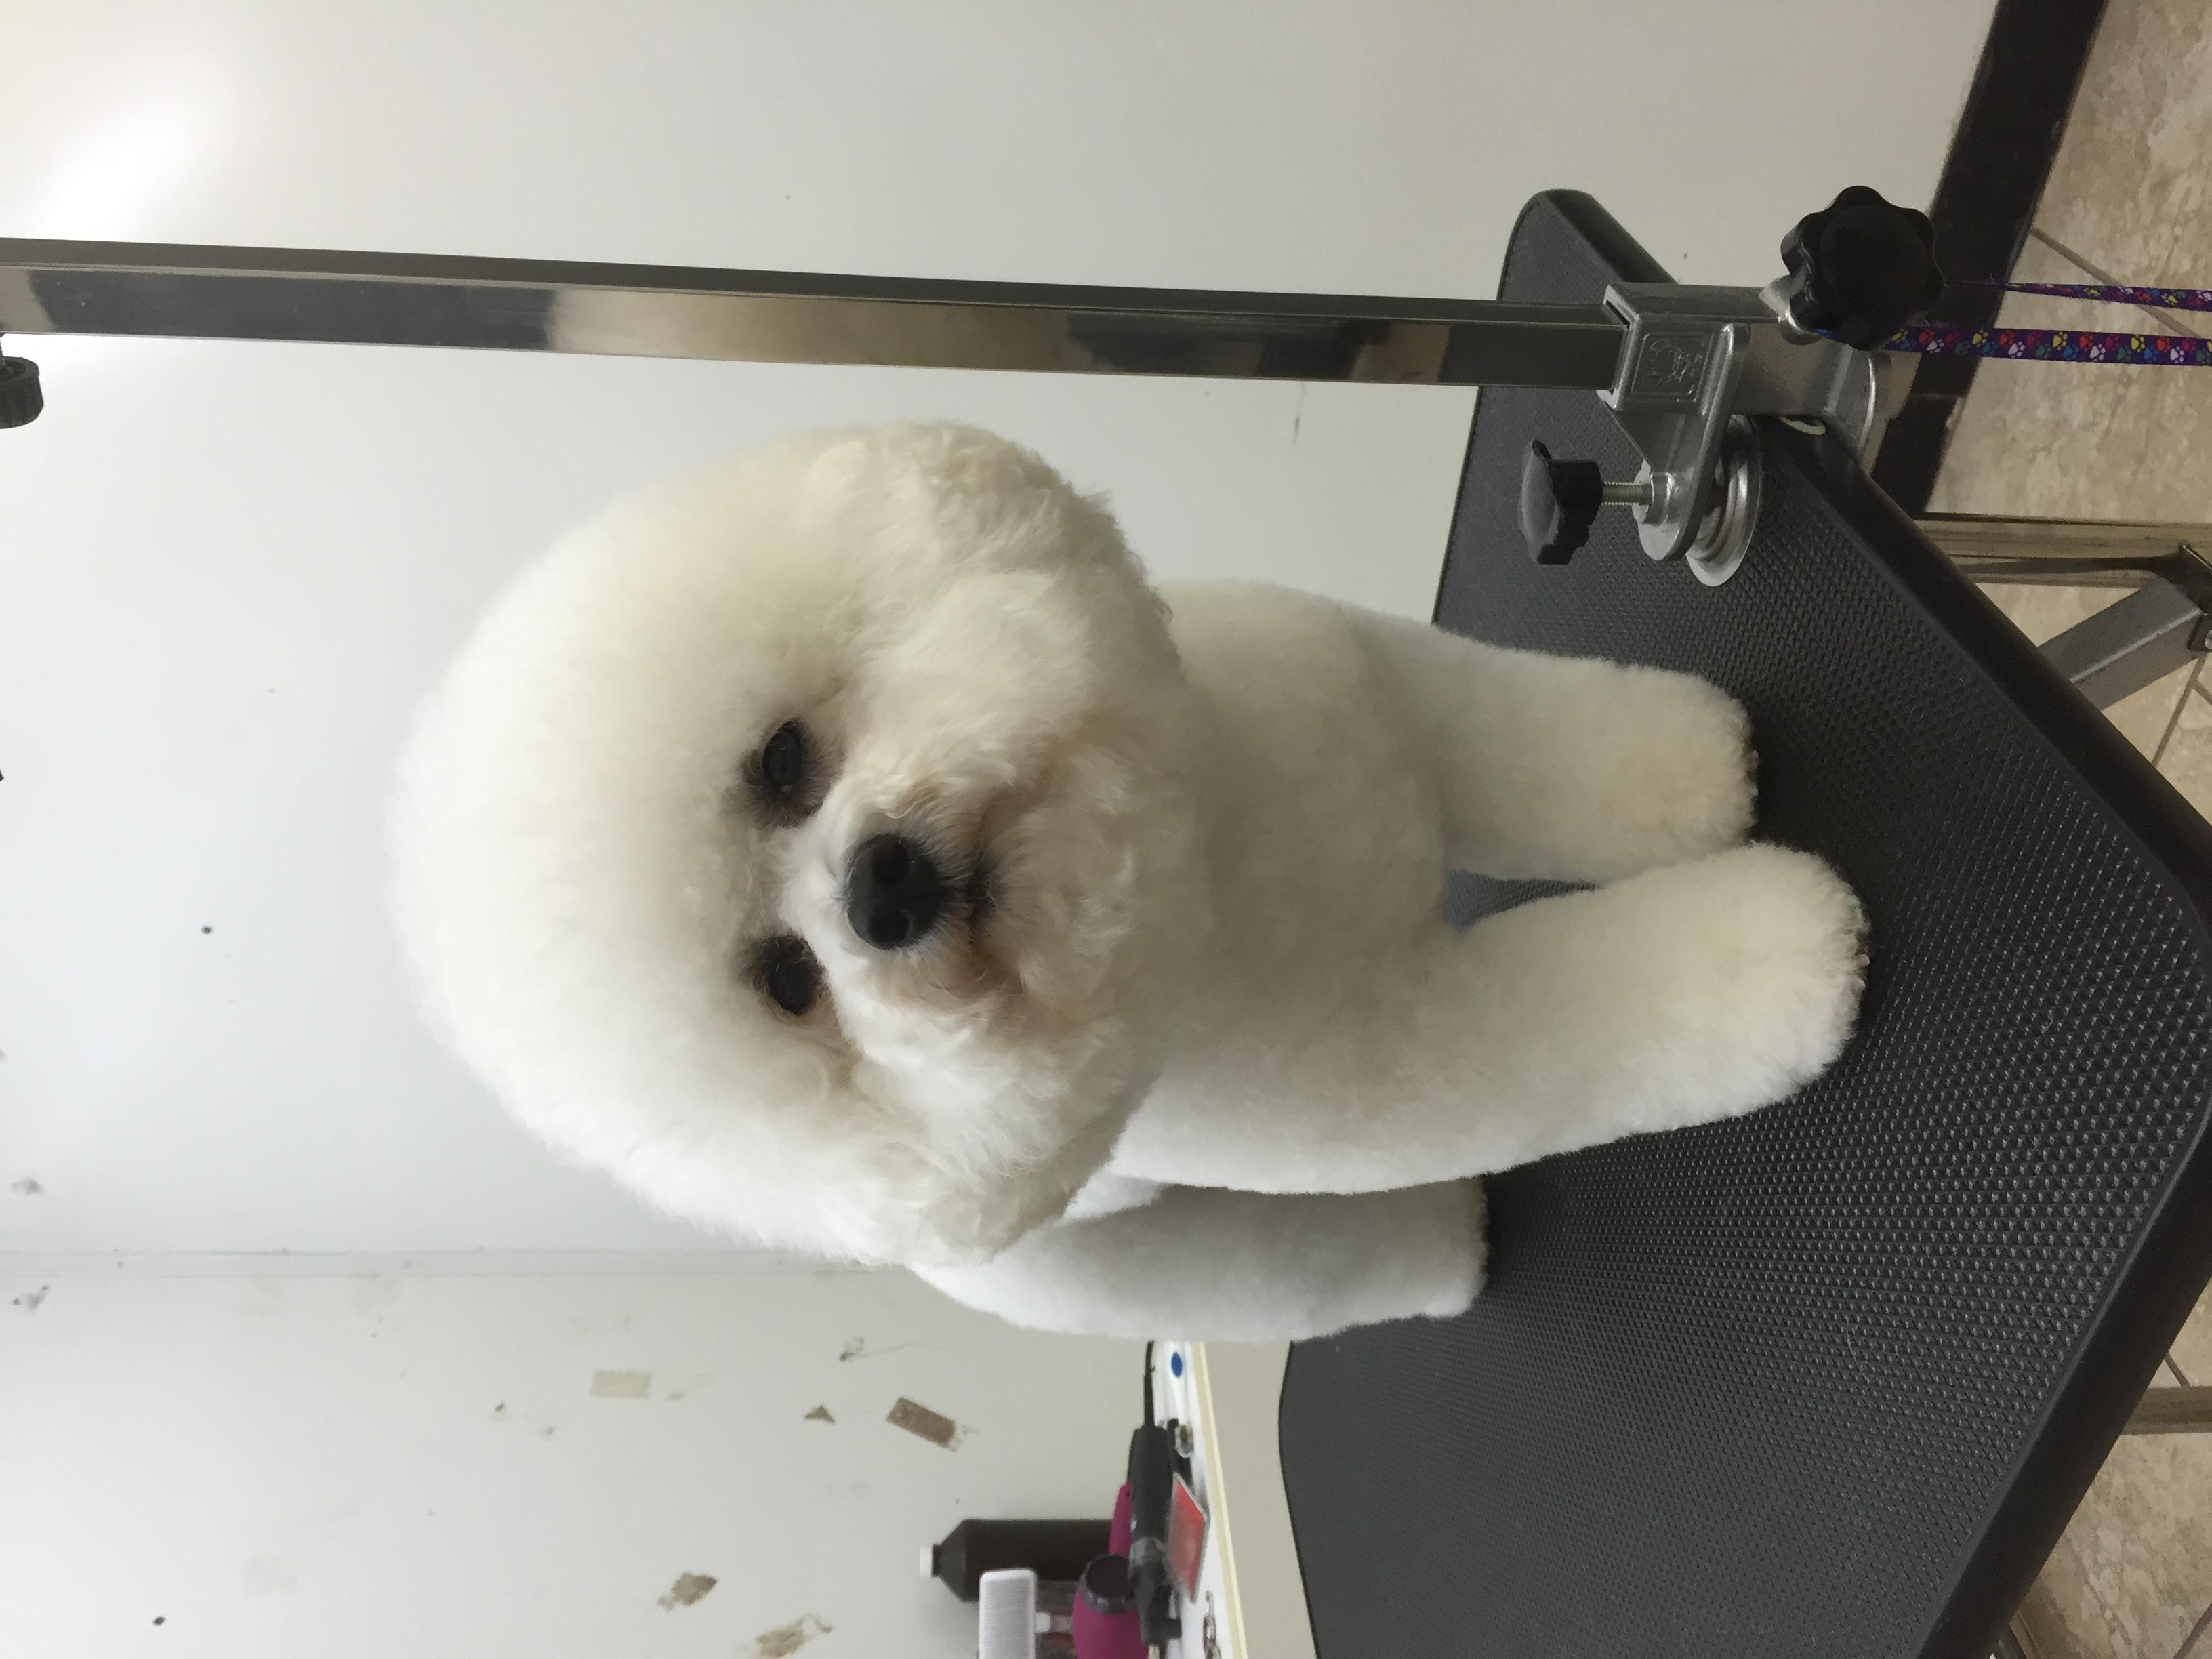 Princess princess dog grooming studio 145 burt rd lexington ky princess princess dog grooming studio 145 burt rd lexington ky 40503 yp solutioingenieria Image collections